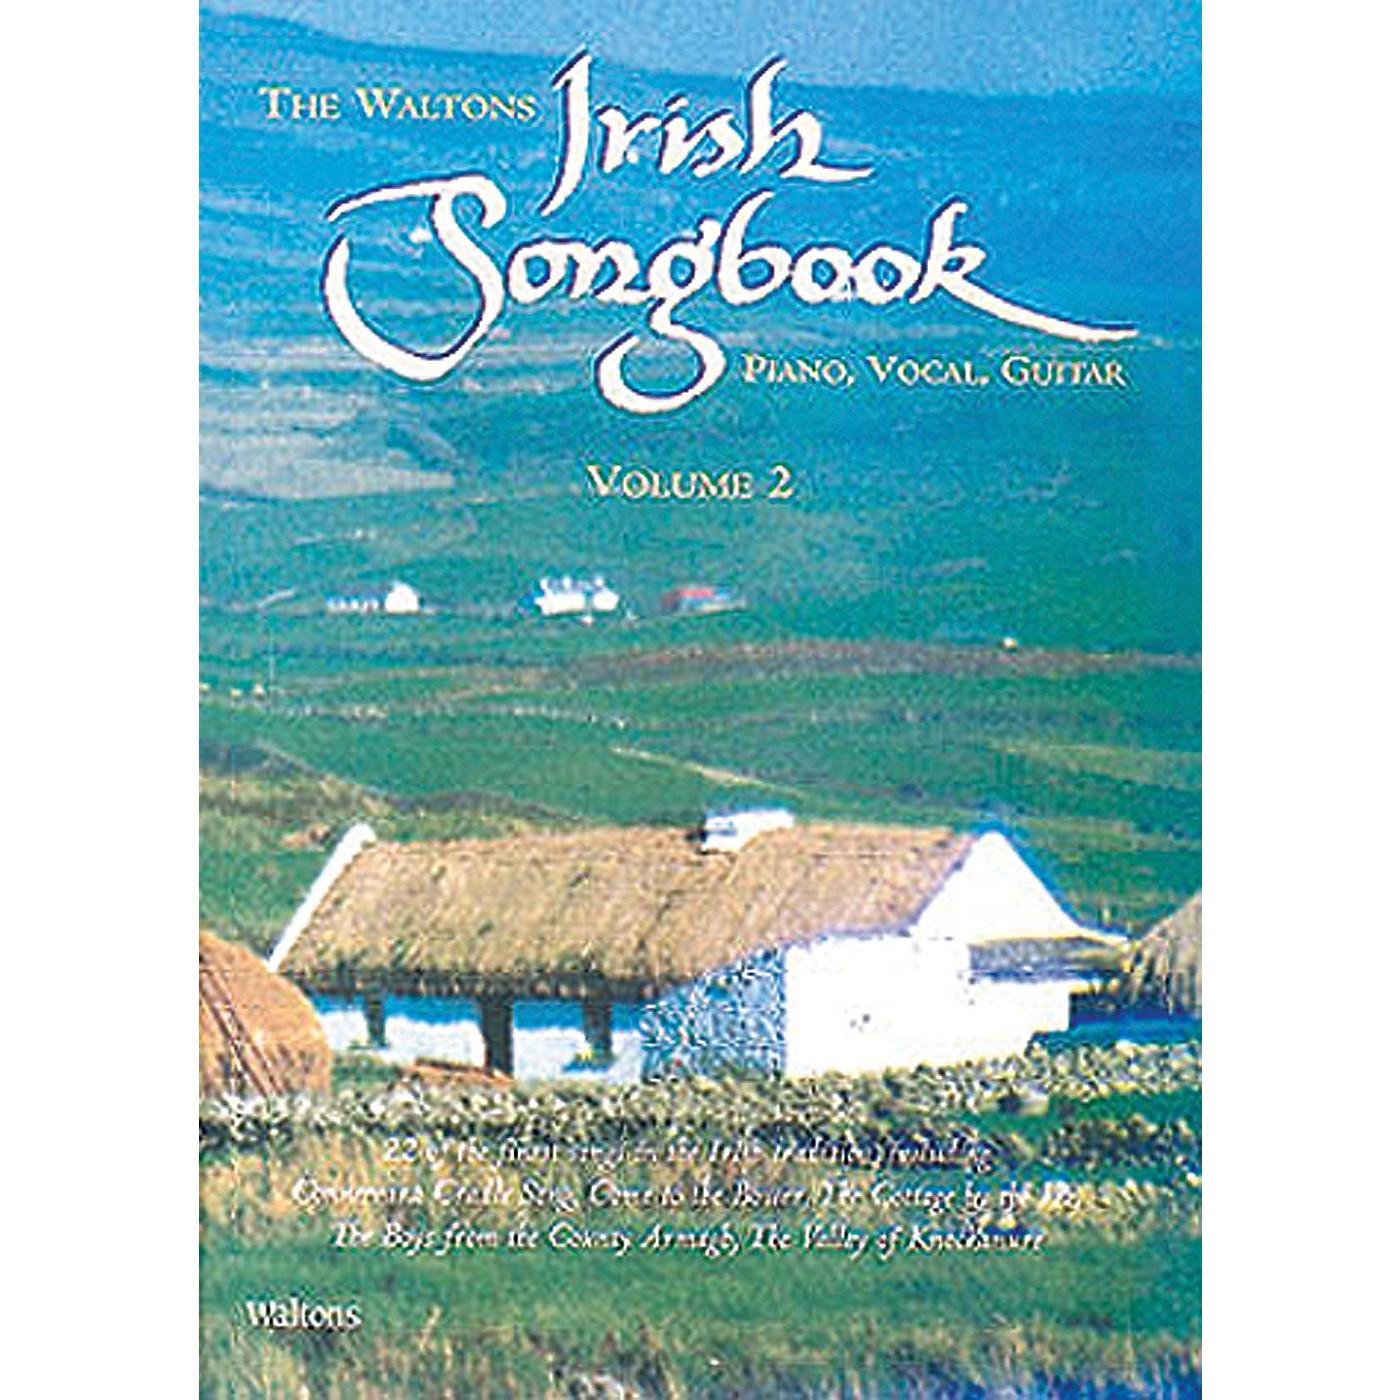 Waltons The Waltons Irish Songbook - Volume 2 Waltons Irish Music Books Series Softcover thumbnail